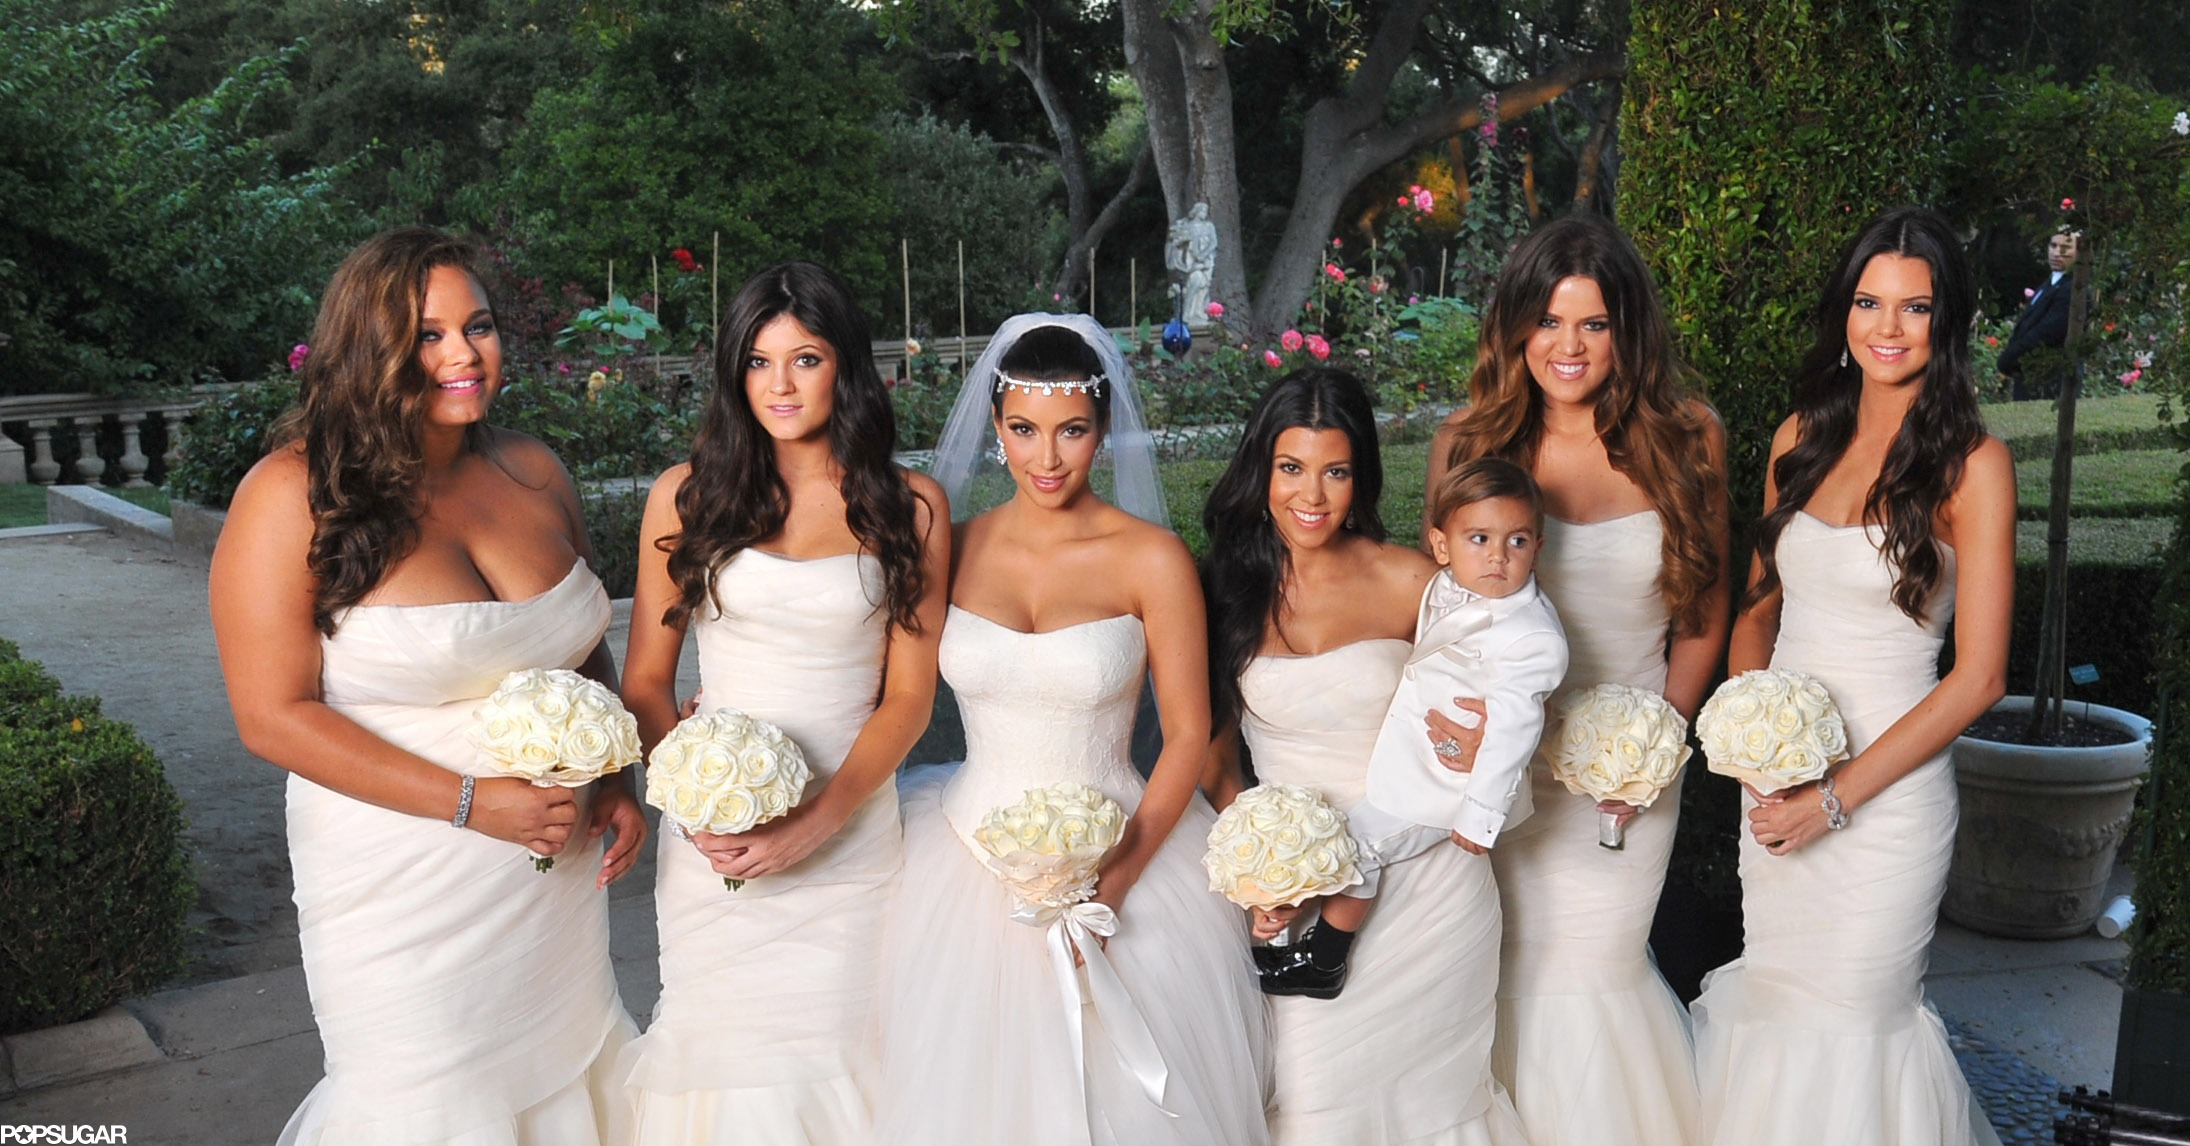 Kim kardashian wedding bridesmaids dresses images braidsmaid kim kardashian wedding bridesmaids dresses images braidsmaid kim kardashian wedding bridesmaids dresses choice image kim kardashian ombrellifo Image collections